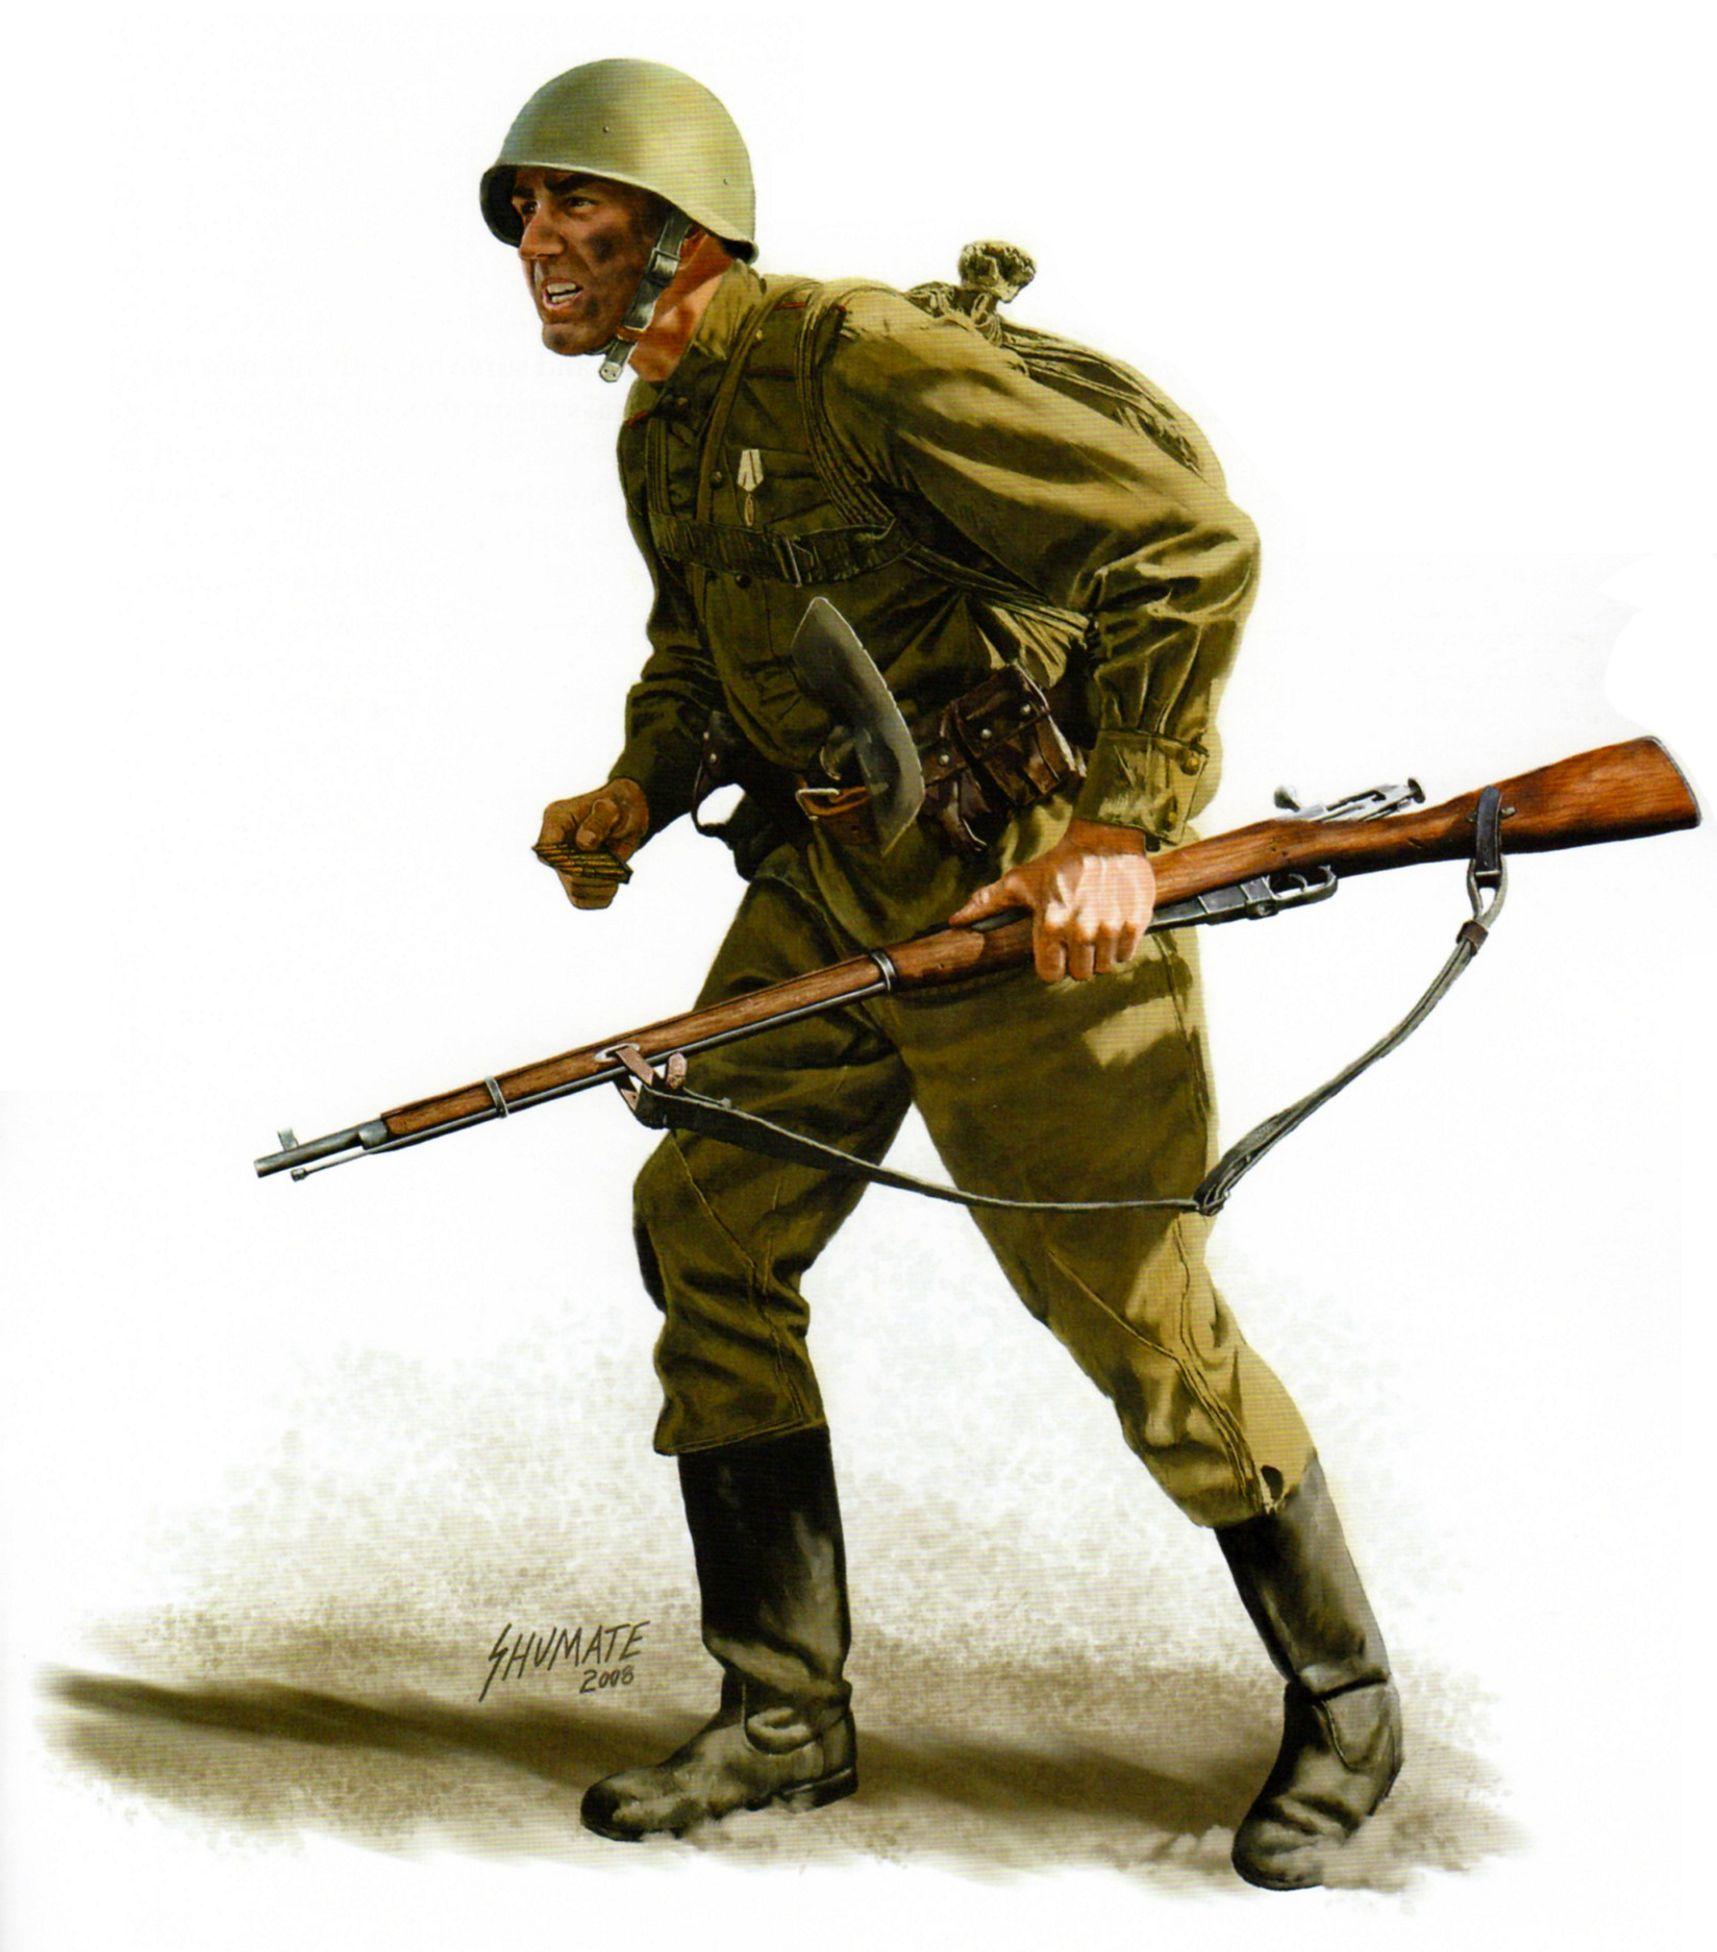 Fusilero soviético, 40.° Ejército Soviético, Frente del Voronezh, Kursk, 1943. Jhonny Shumate.